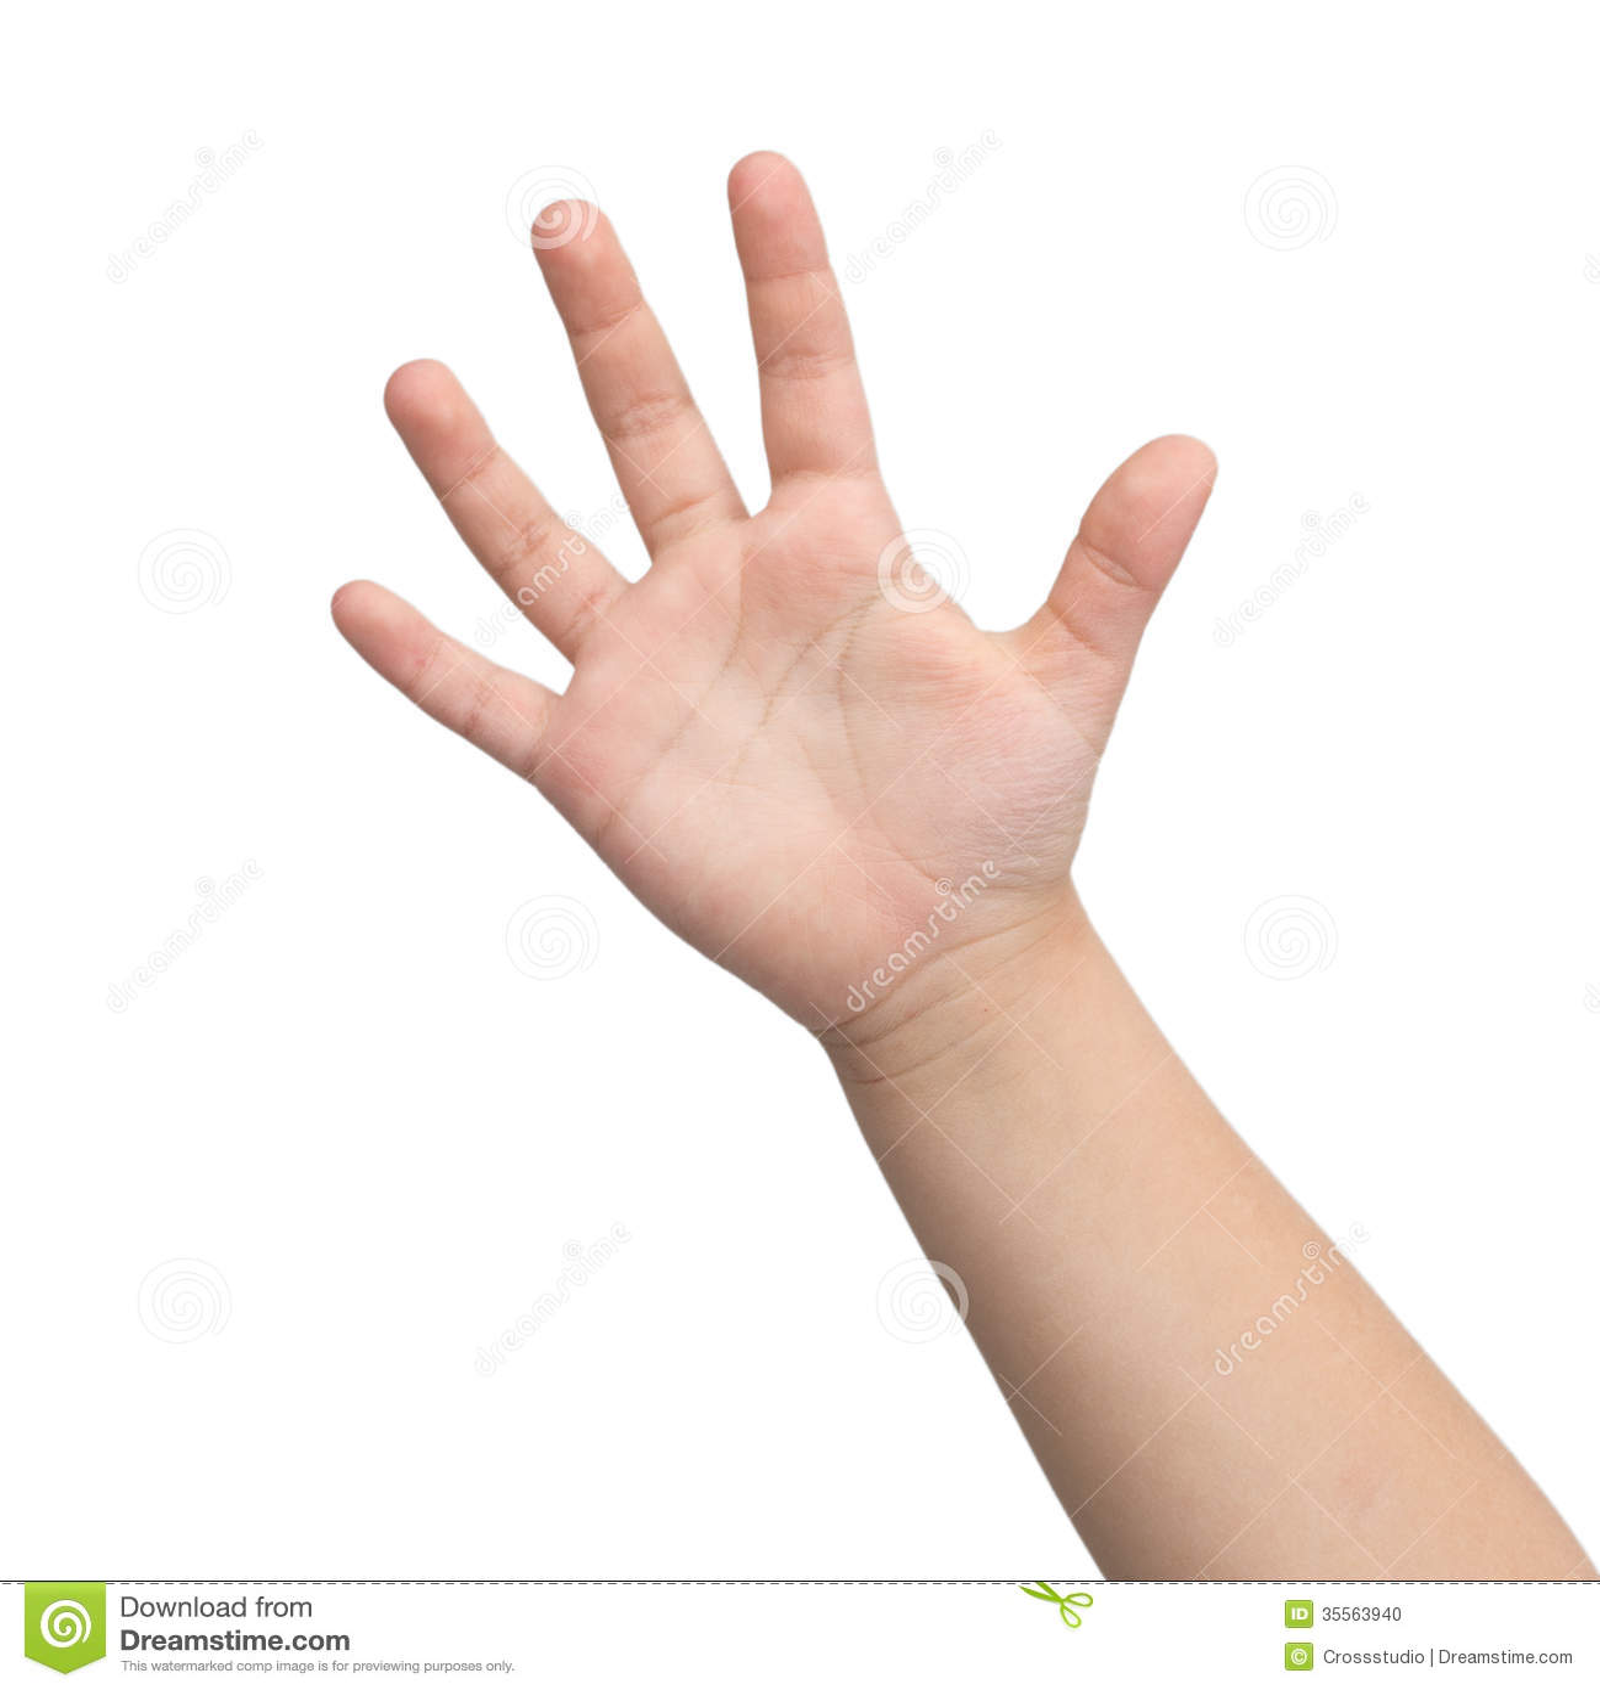 Communicaiton hand gestures with kids essay